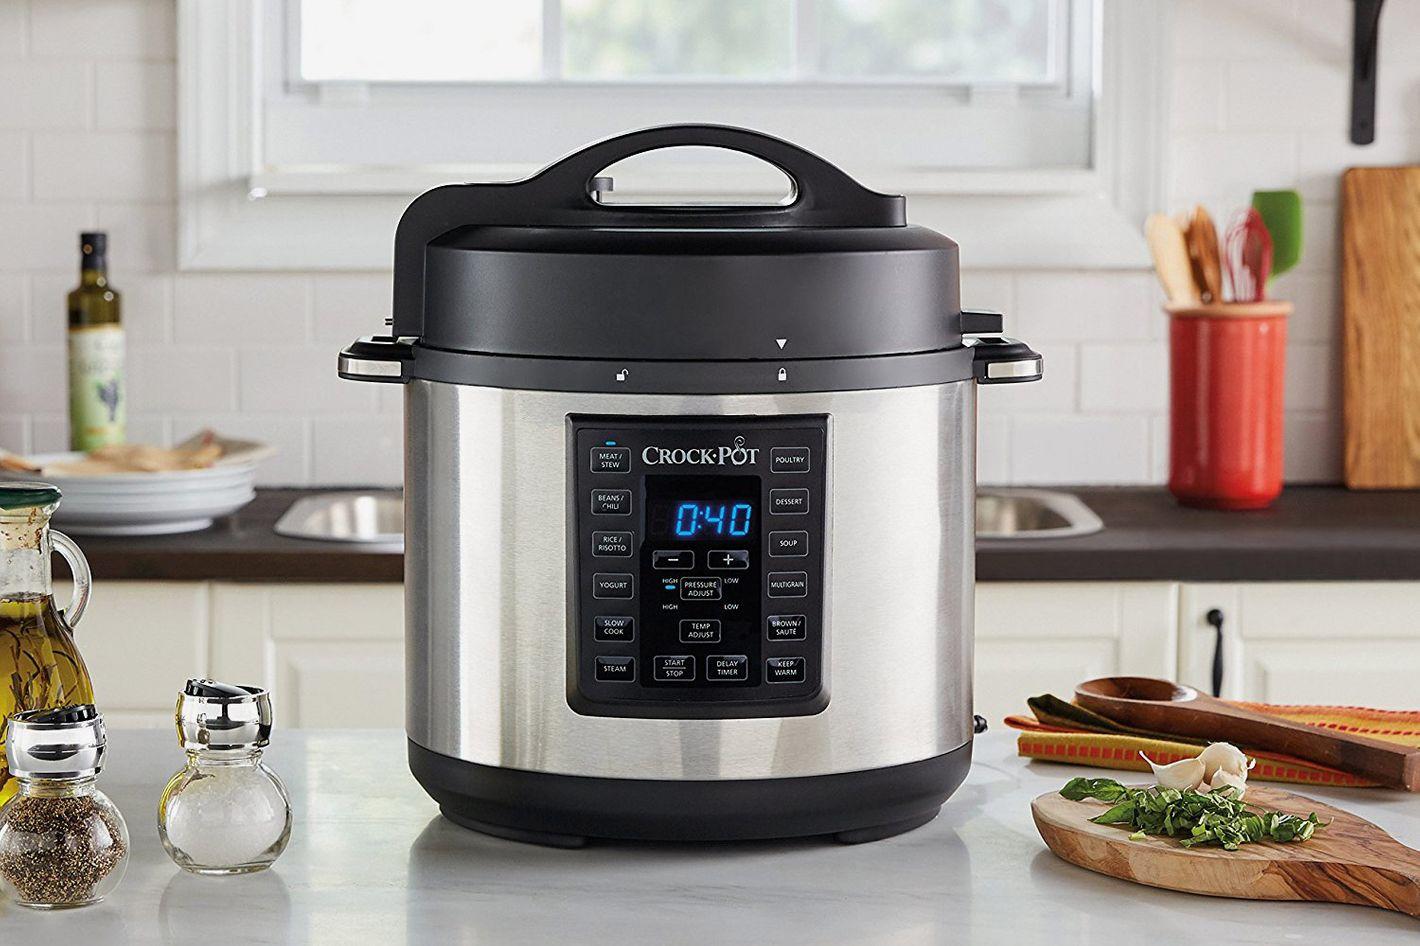 Crock-Pot 6 Qt 8-in-1 Multi-Use Express Crock Programmable Slow Cooker